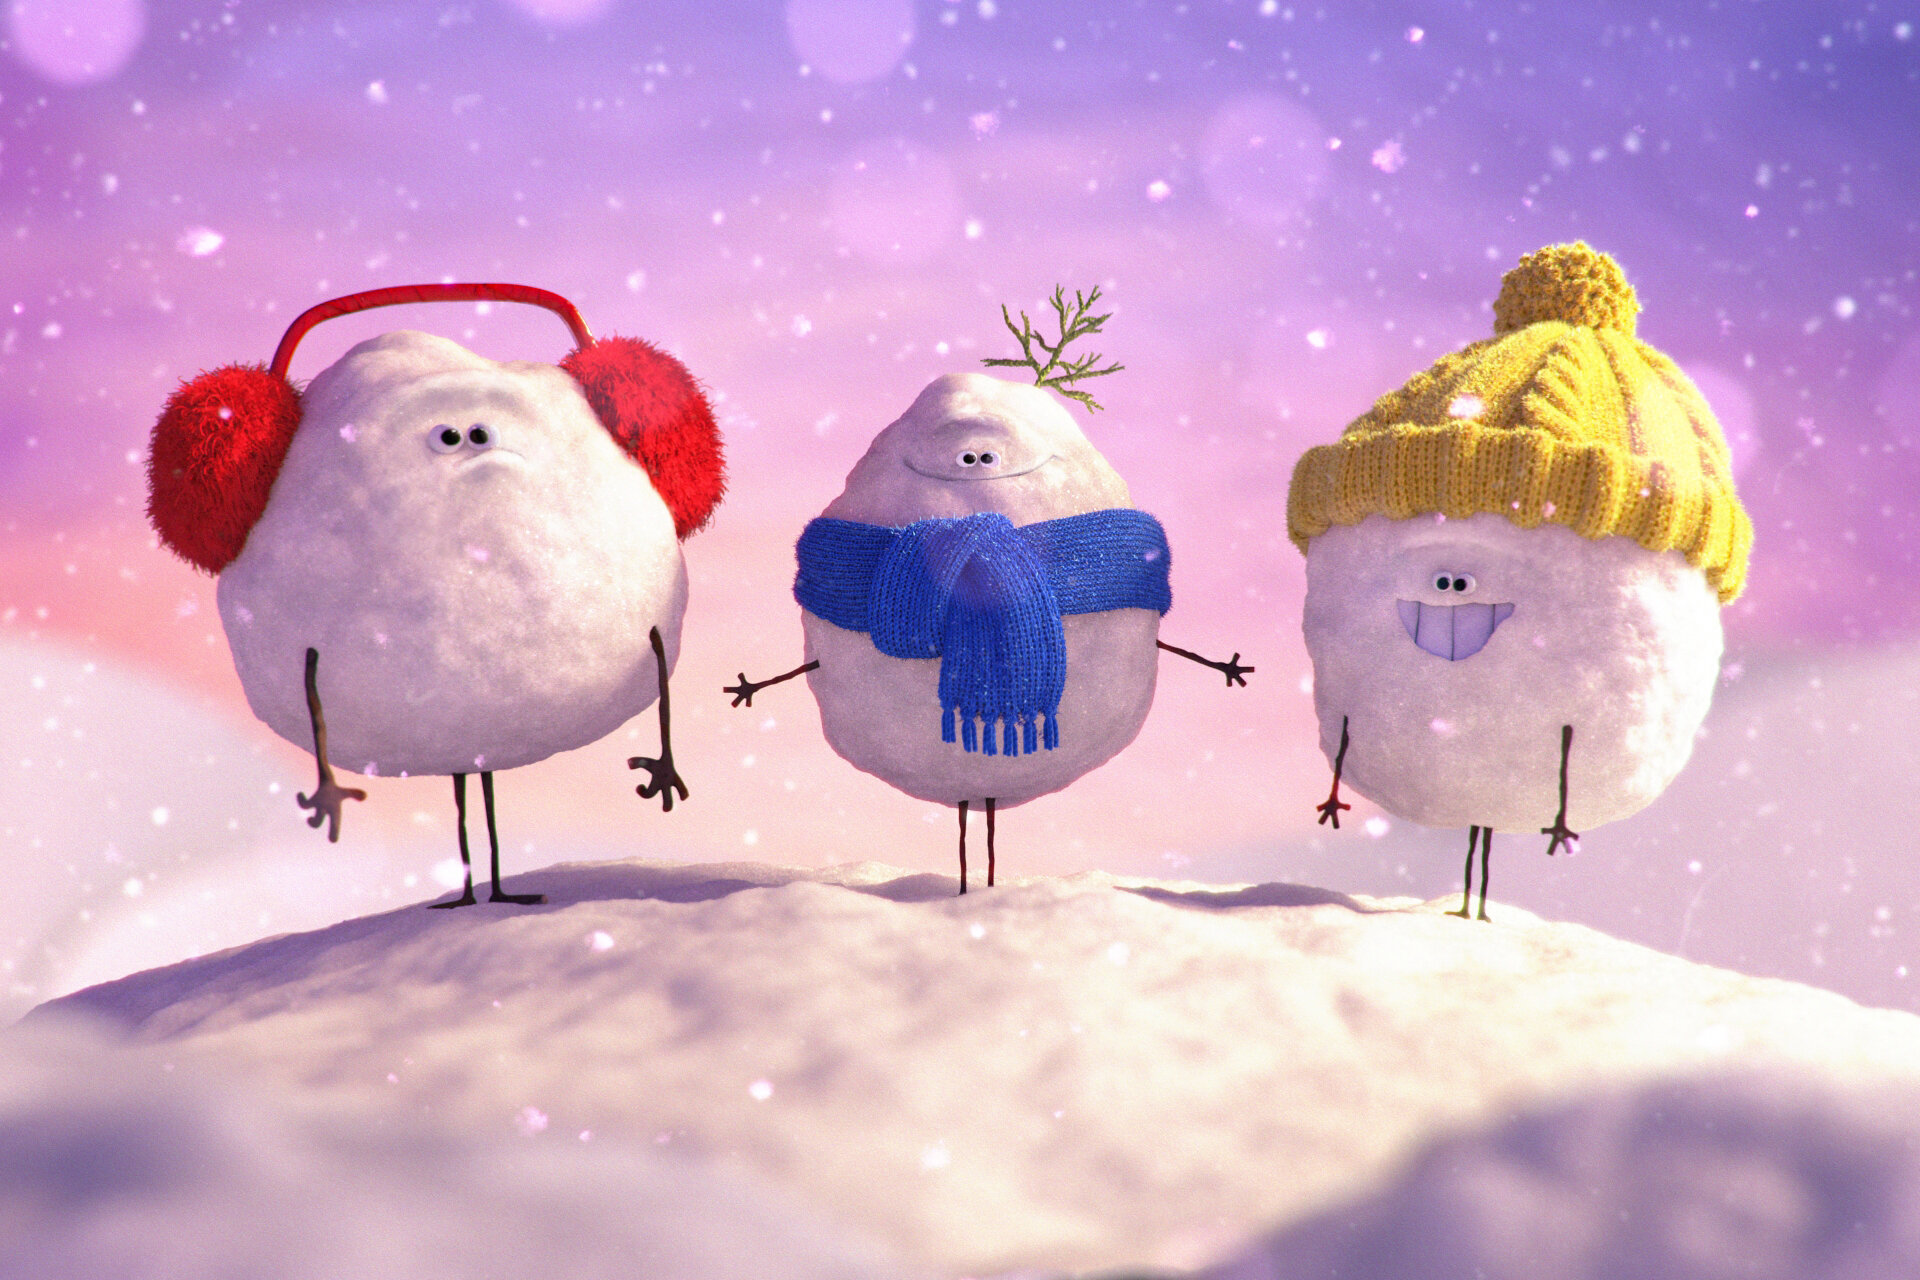 snowballs_comp_v04.0001.jpg